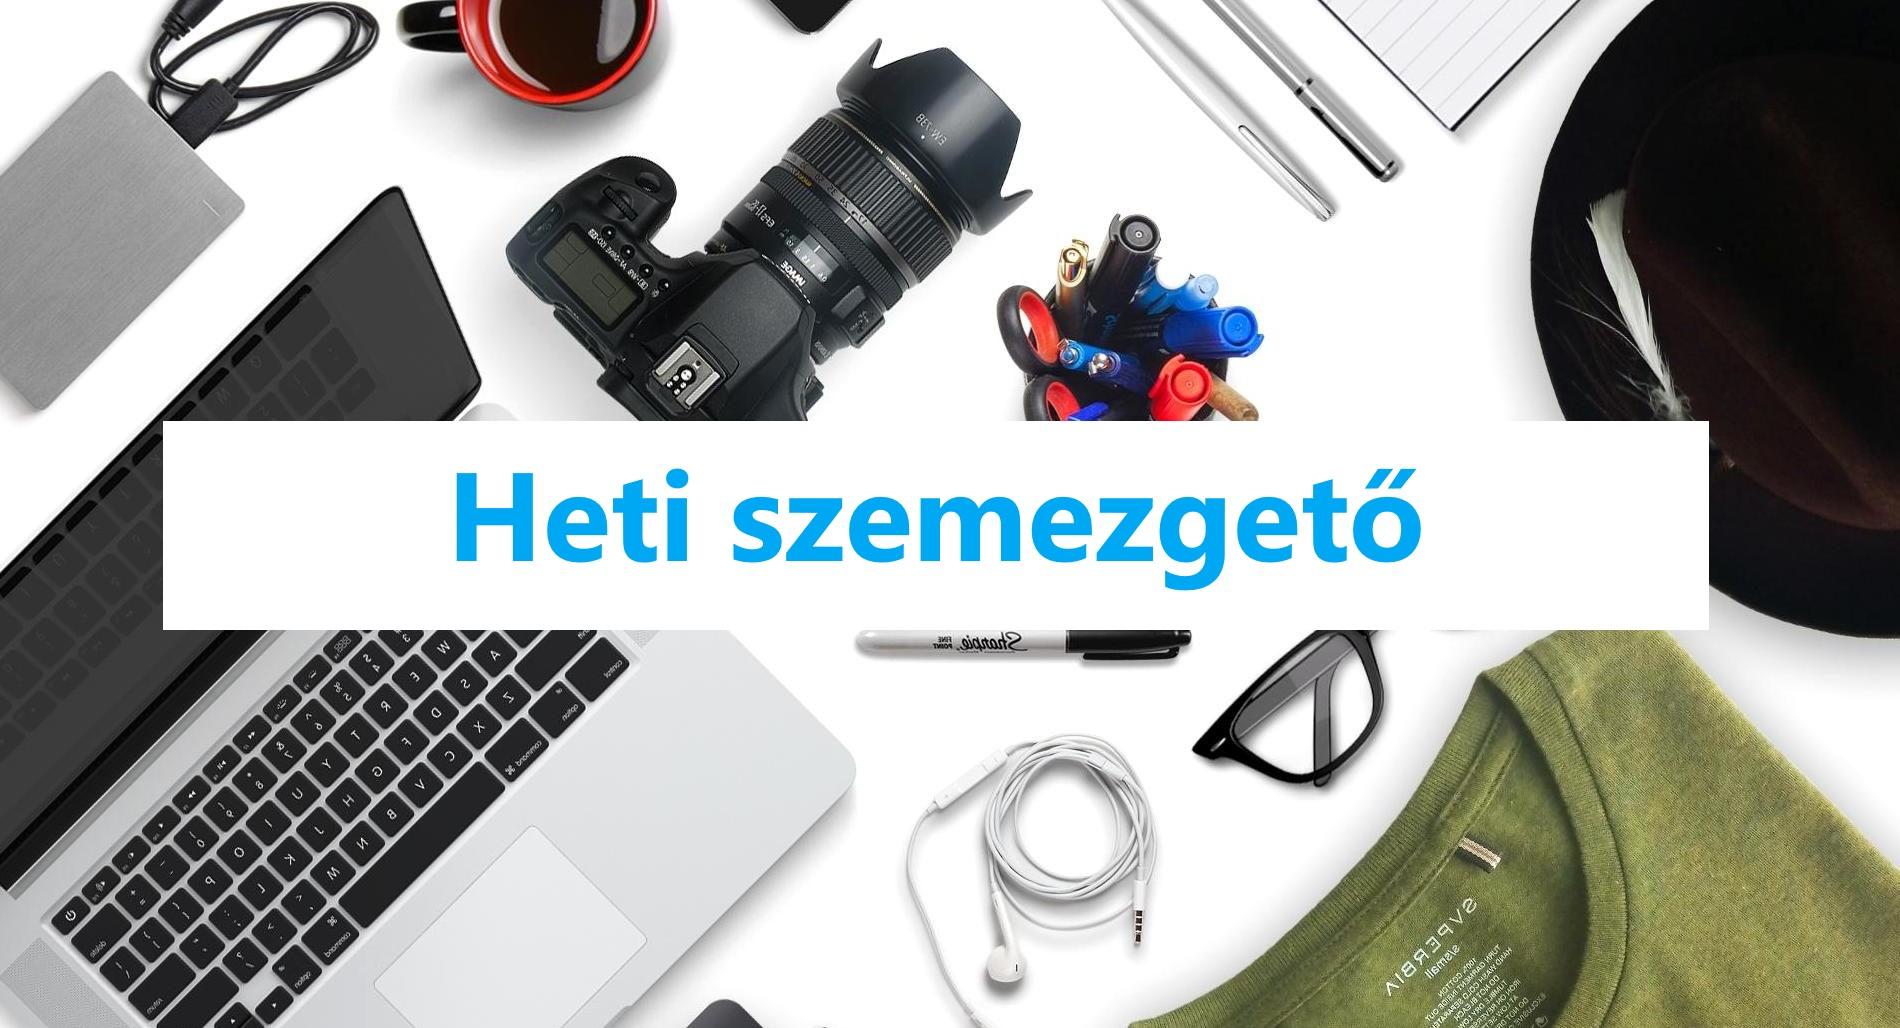 heti_szemezgeto_uj_85.jpg